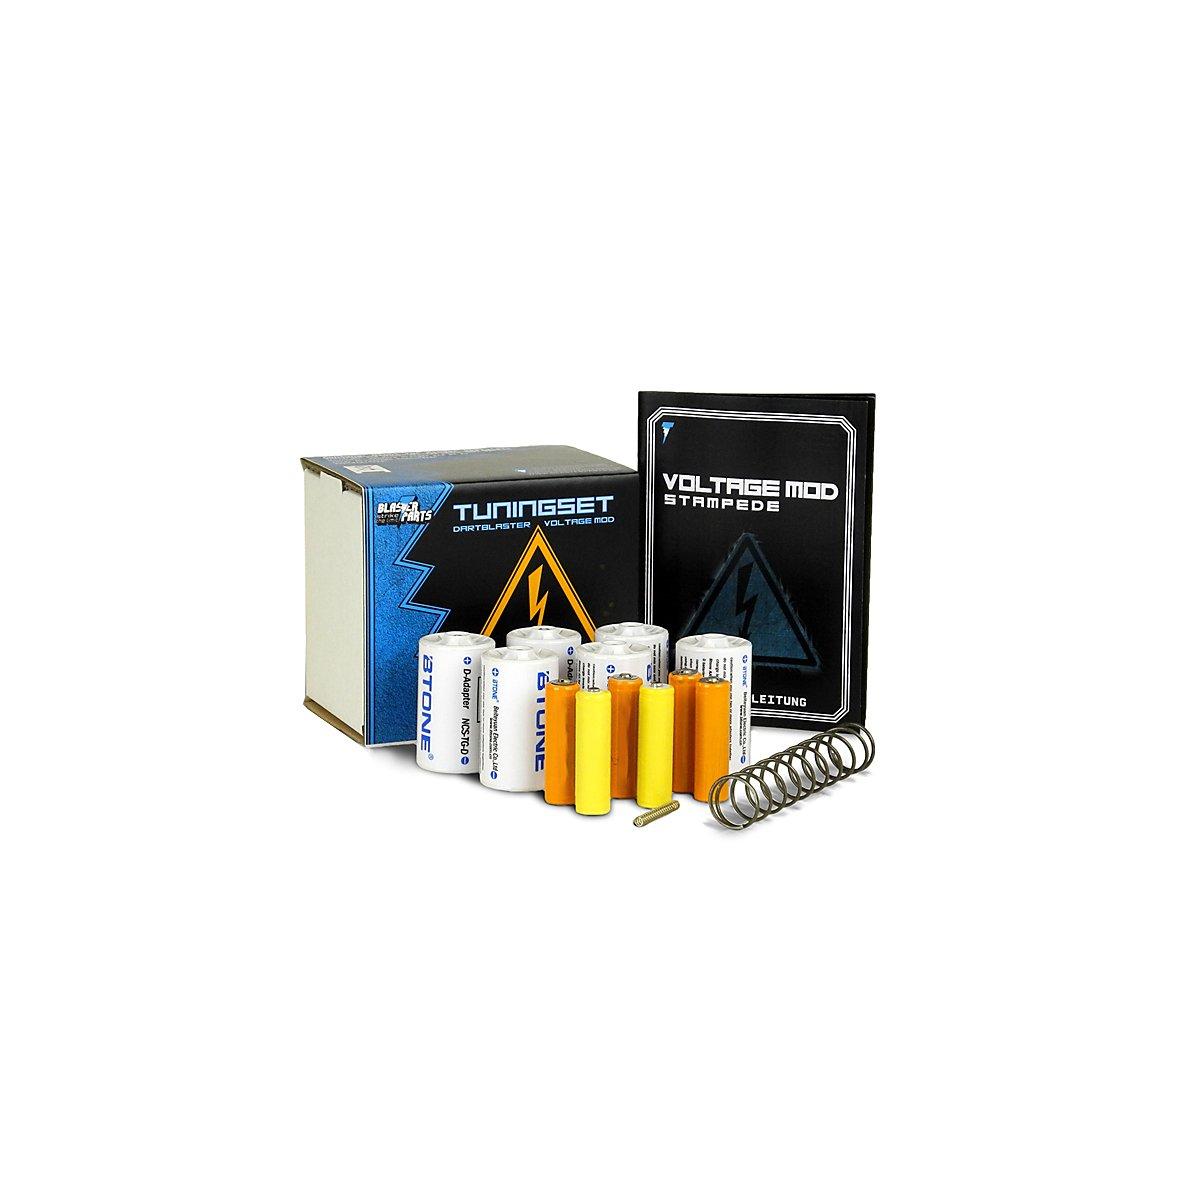 Blasterparts Voltage Set F 252 R Nerf Stampede Ecs 60